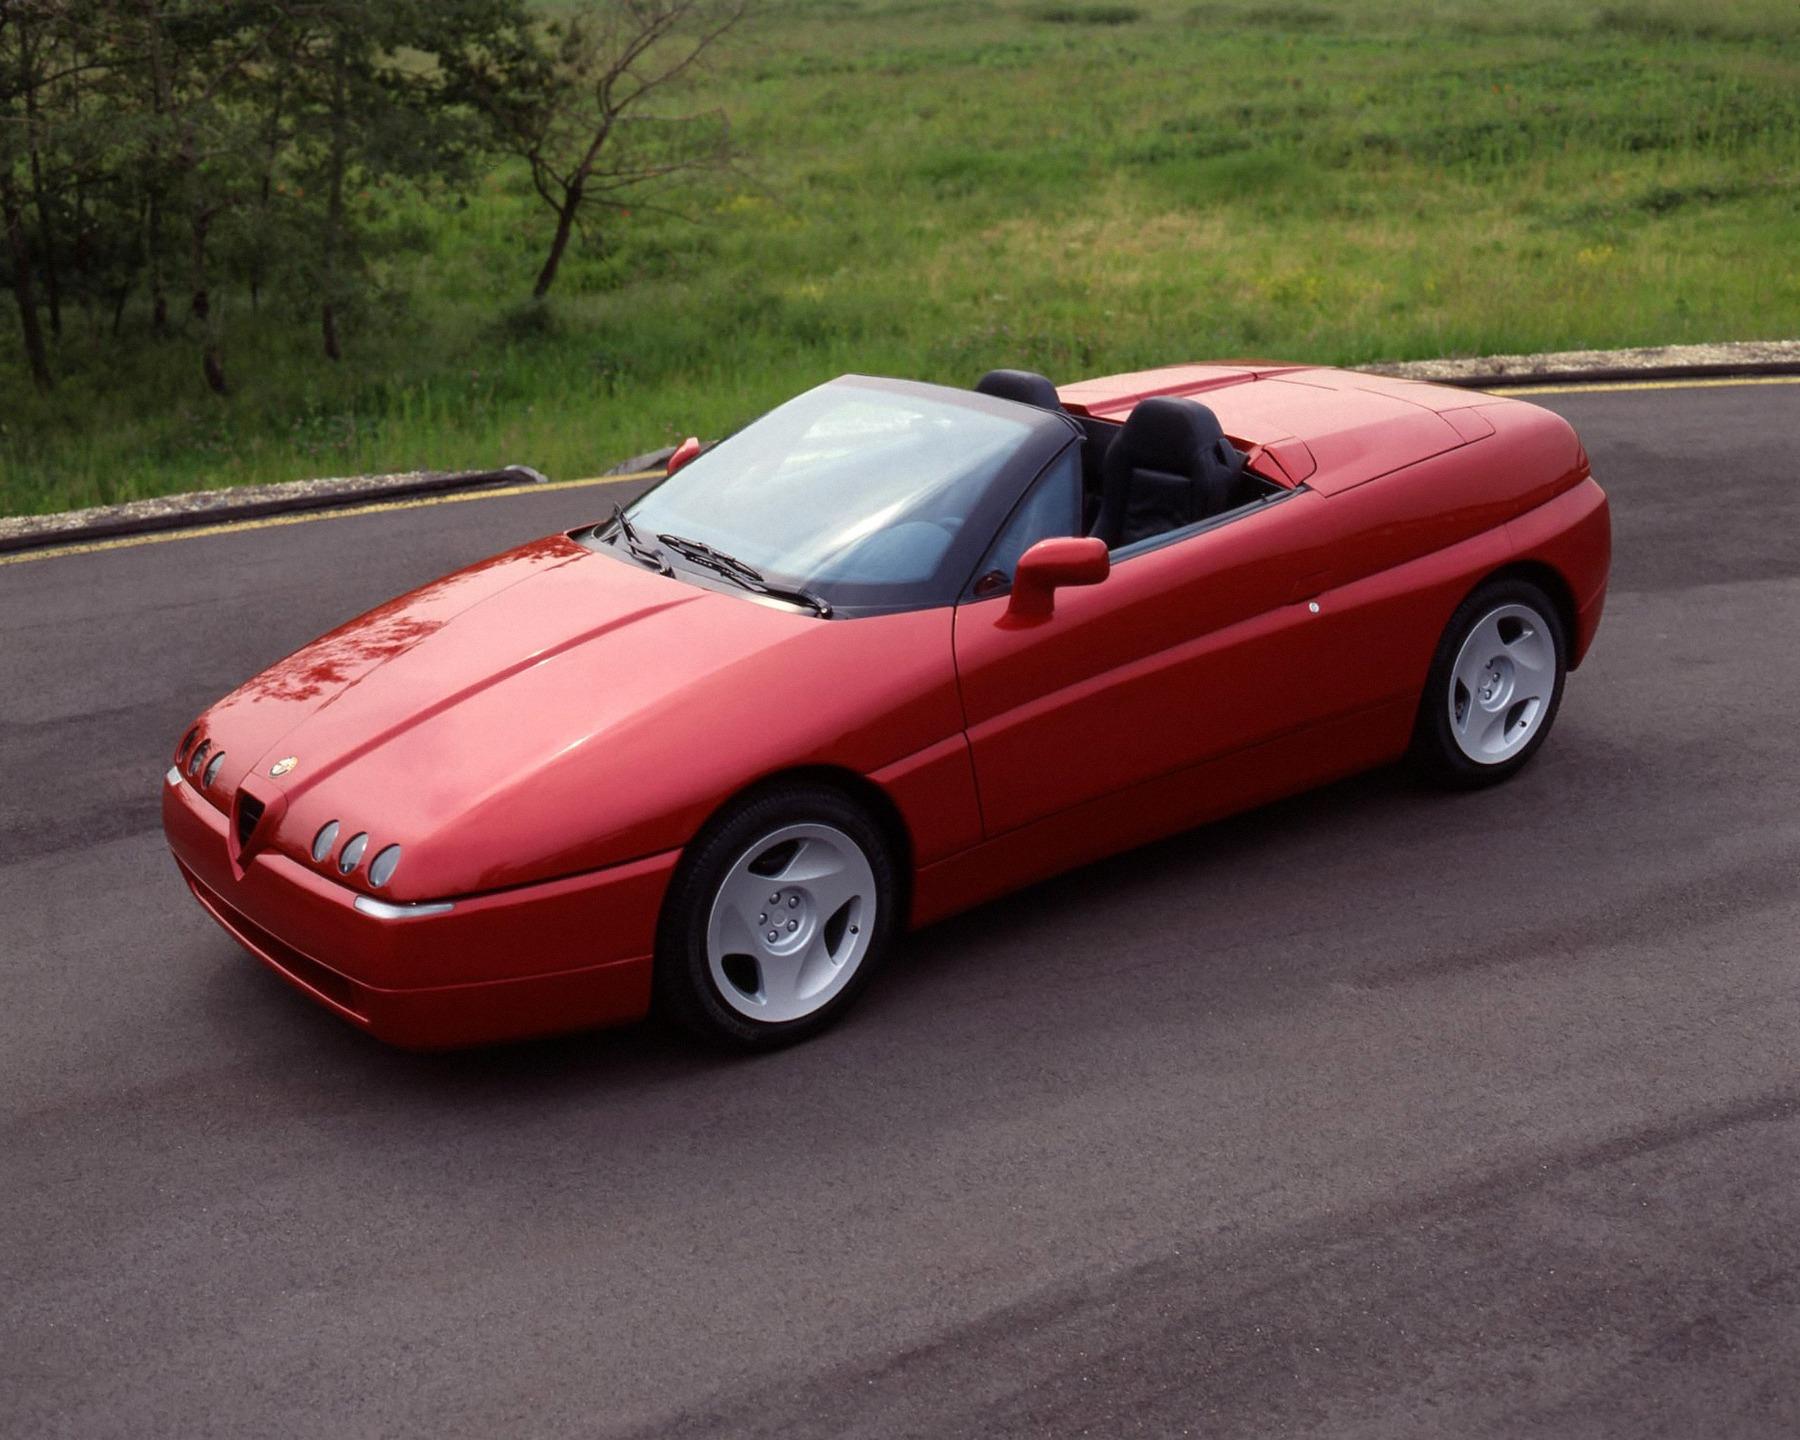 1991-Alfa-Romeo-164-Proteo-05